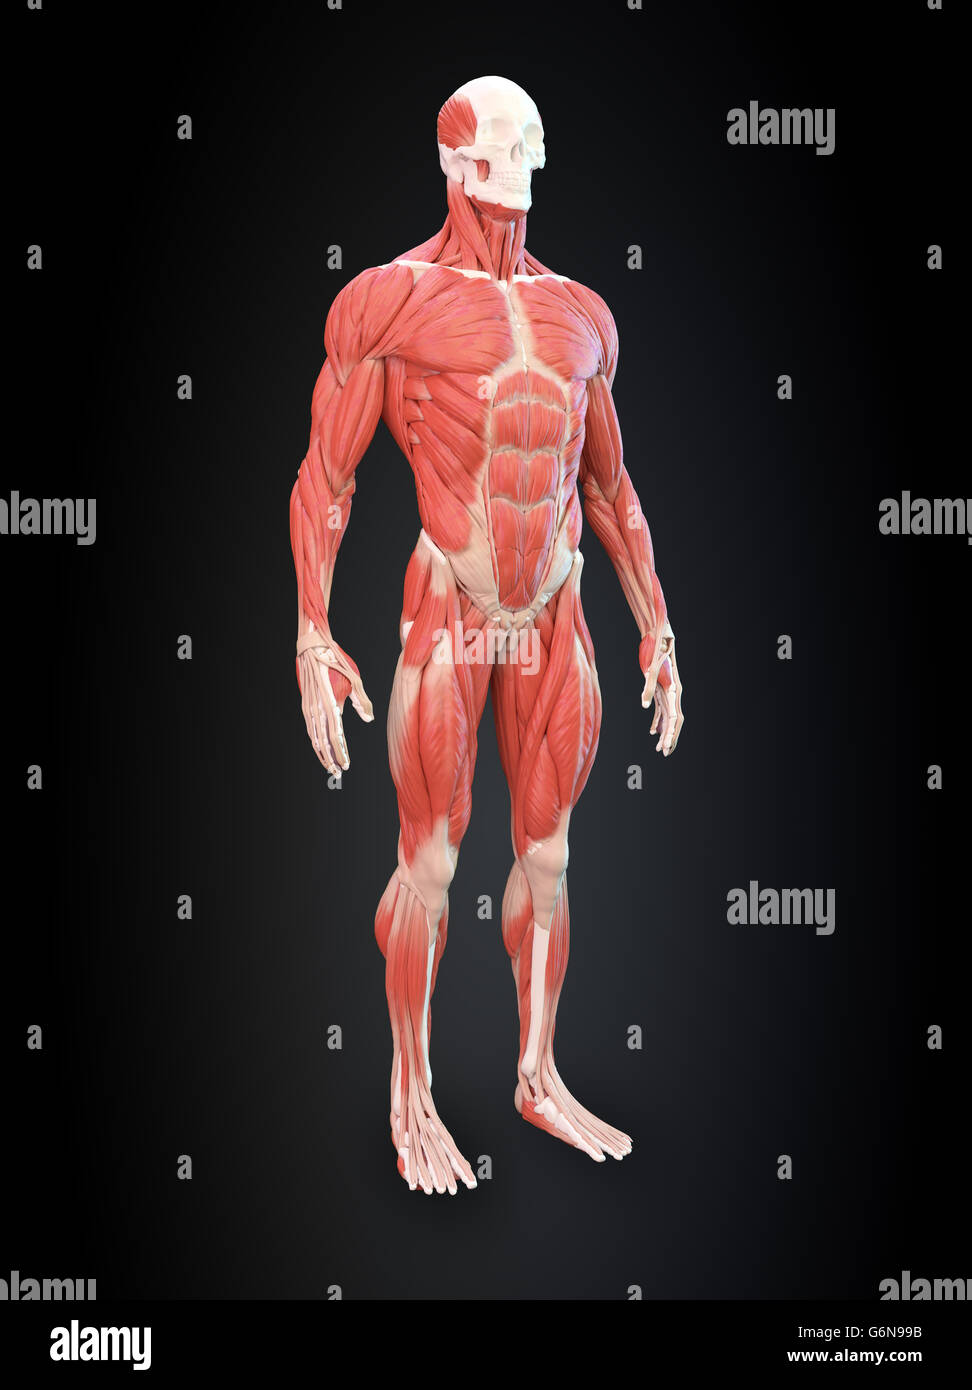 Human Muscular System Imágenes De Stock & Human Muscular System ...